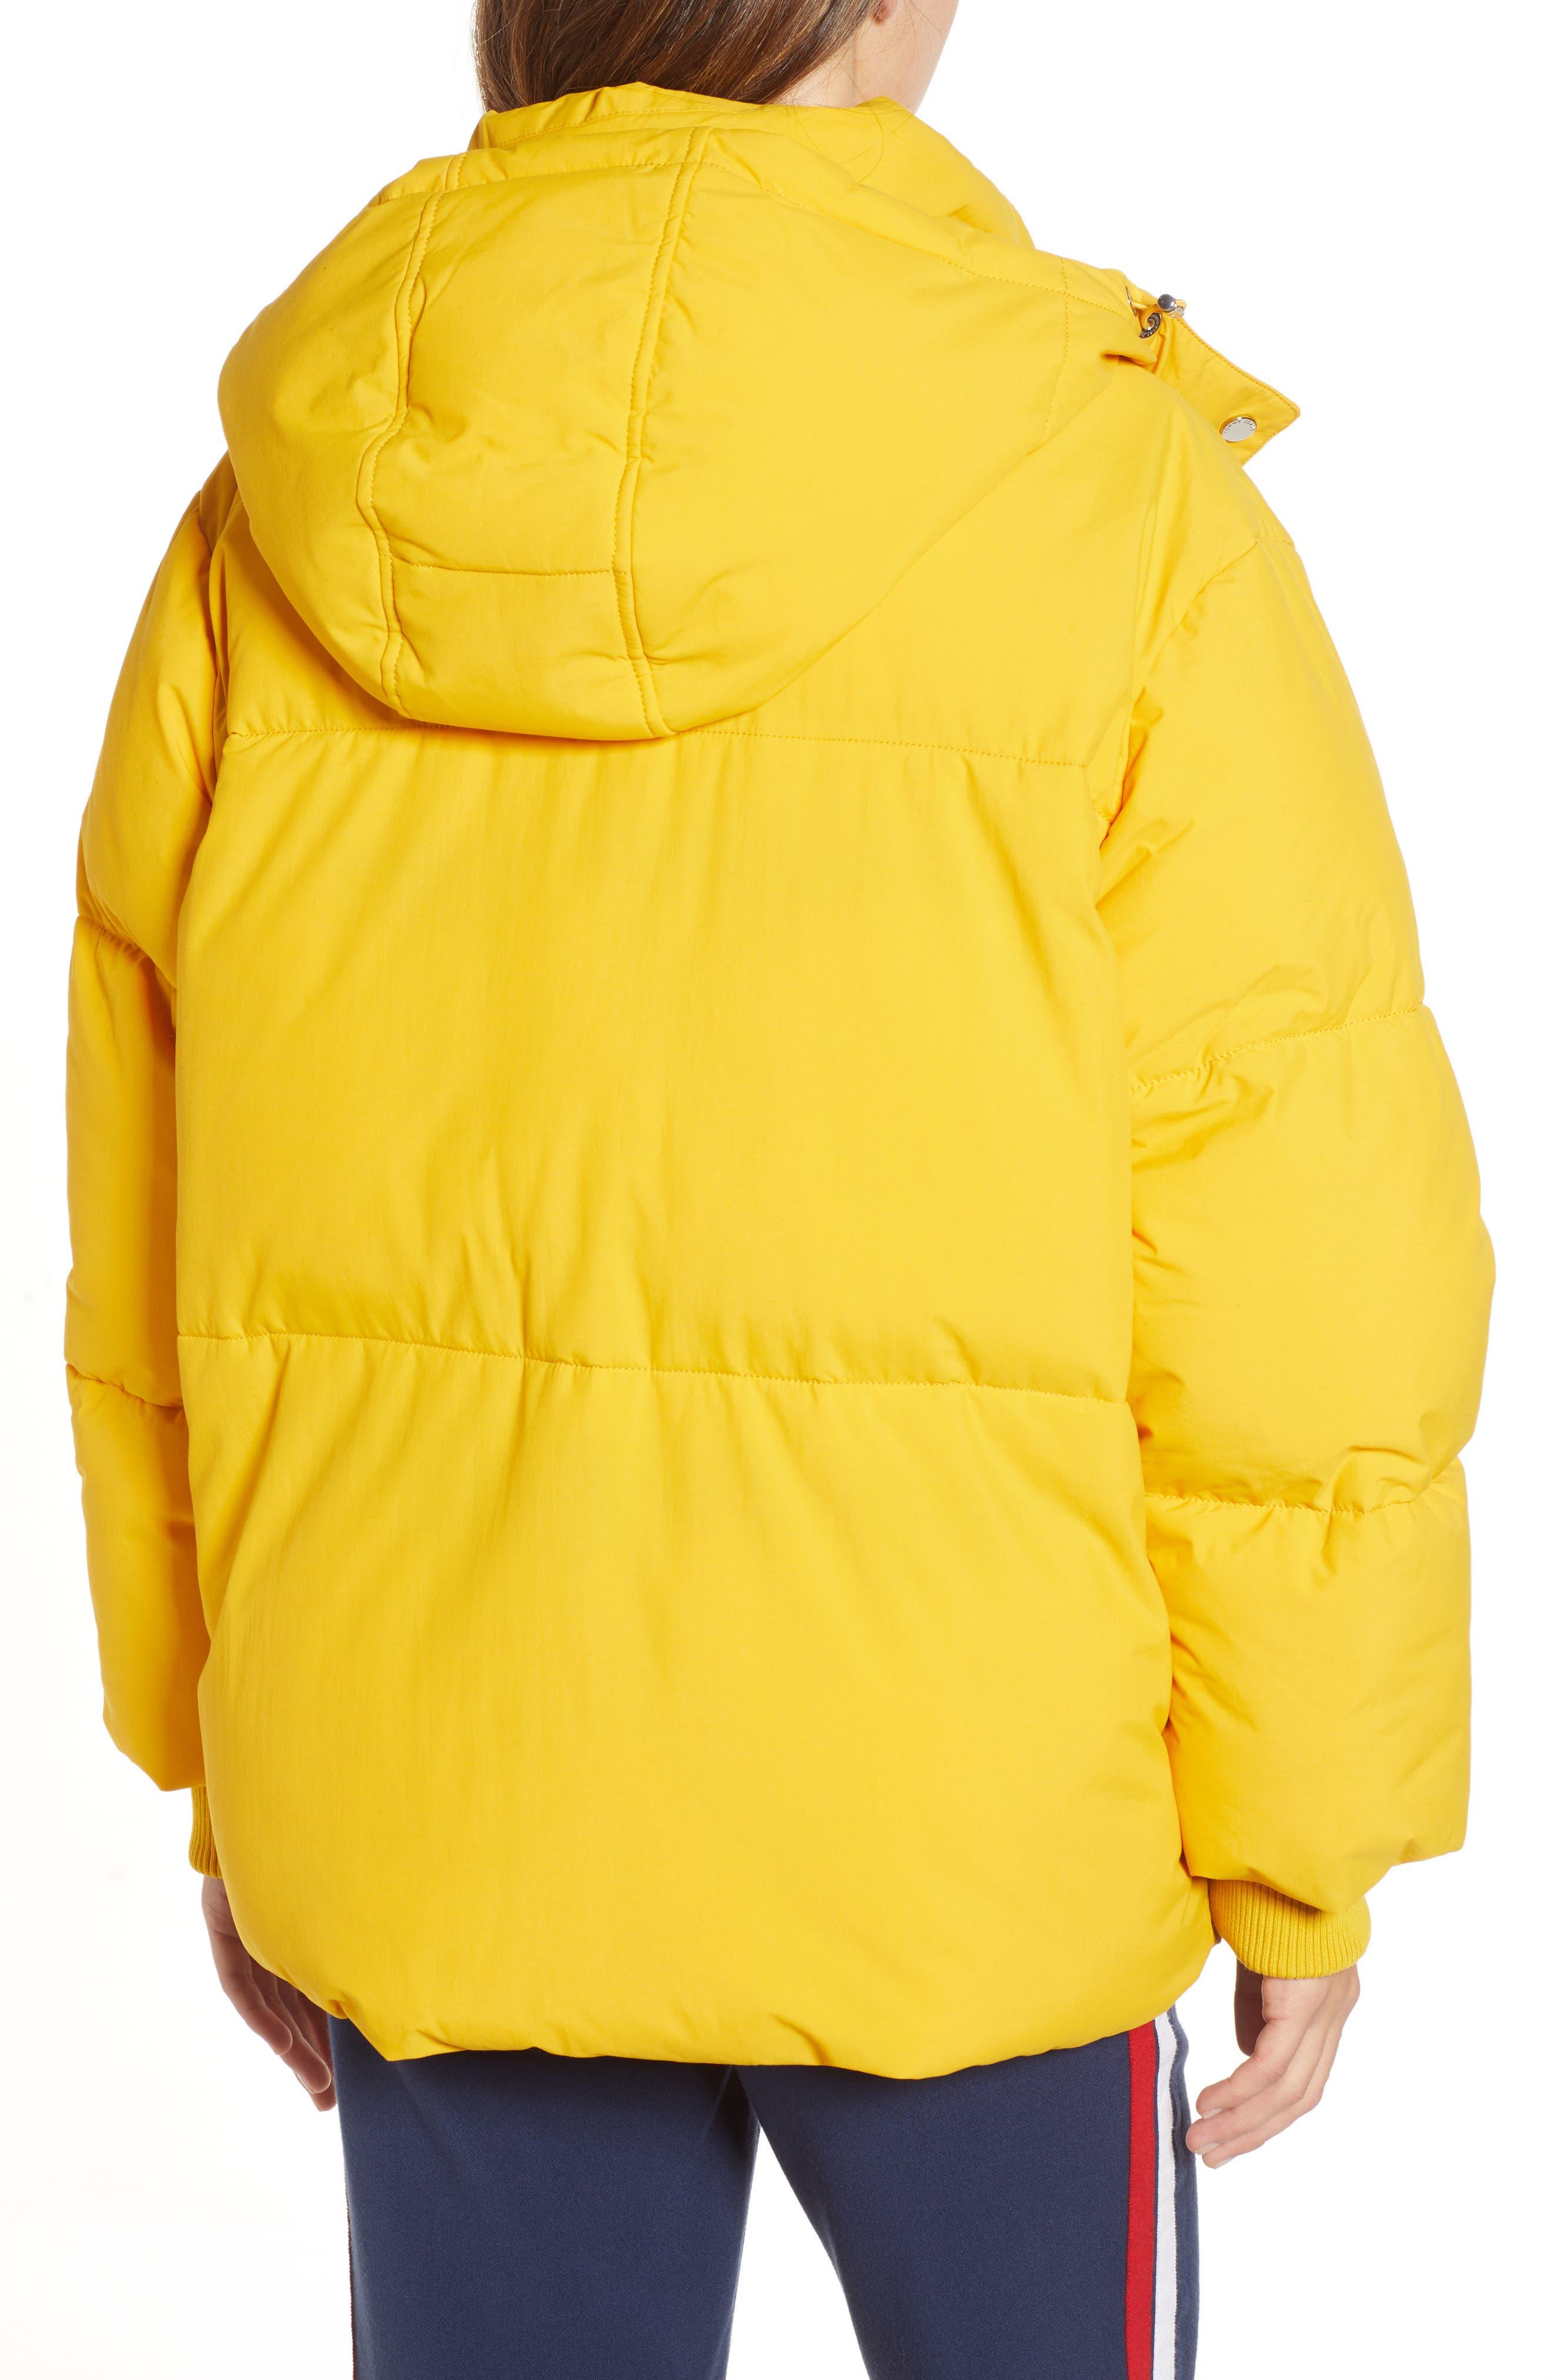 TJW Oversized Puffer Jacket,                             Alternate thumbnail 2, color,                             MANGO MOJITO